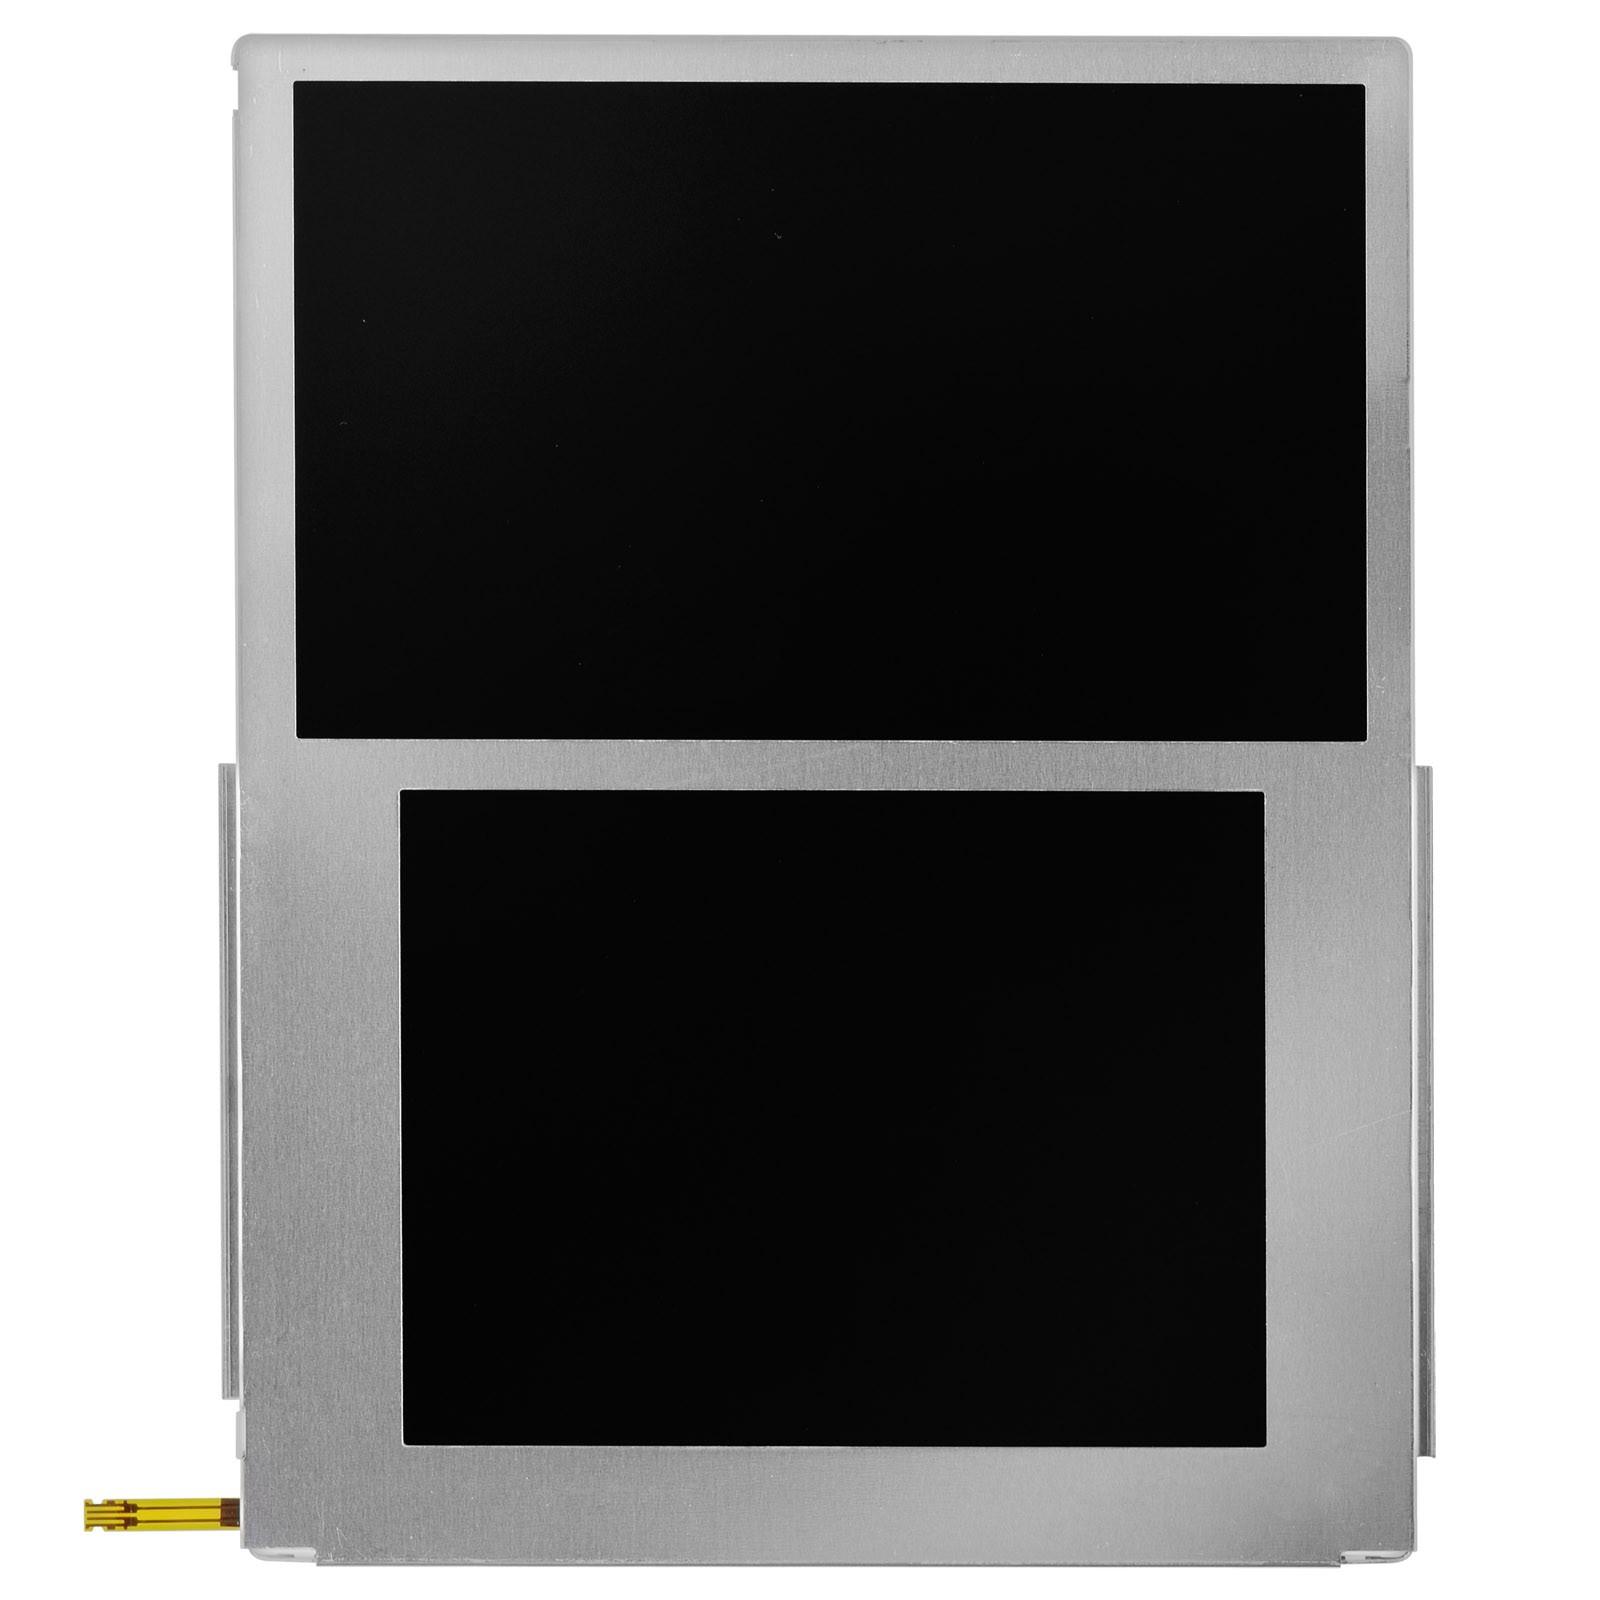 2DS Display Superiore e Inferiore Originale